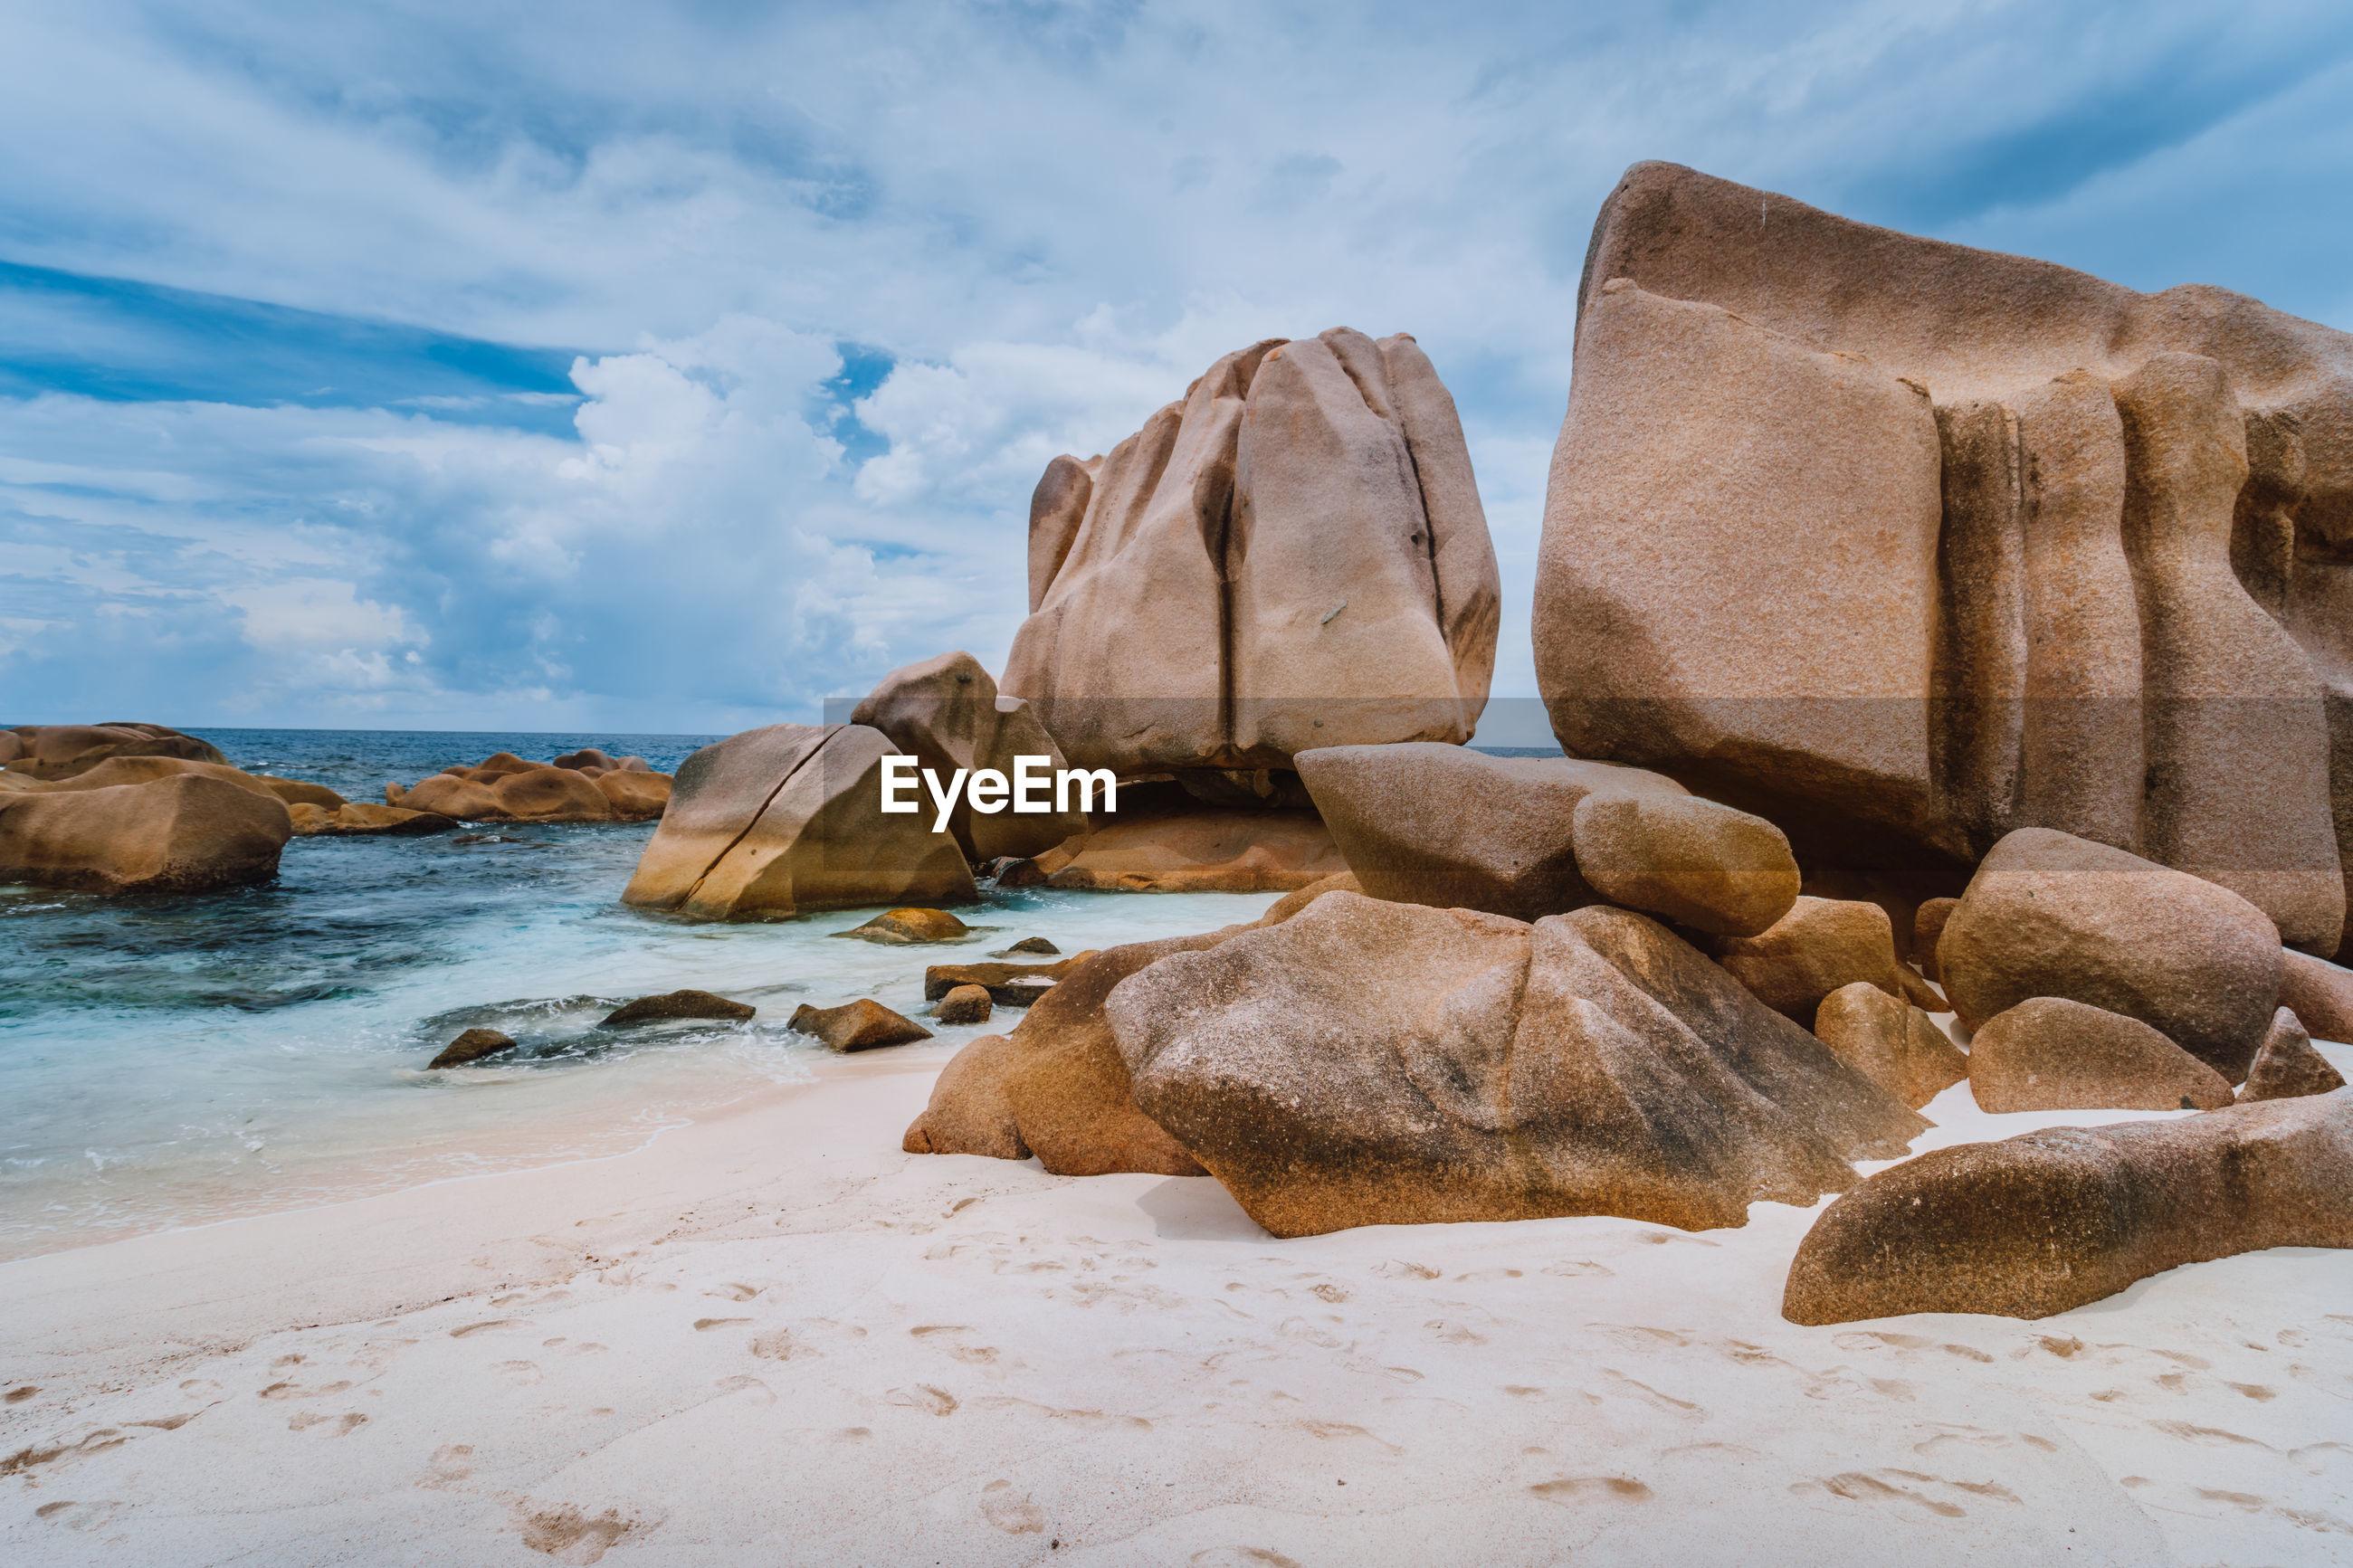 ROCKS ON SHORE AGAINST SEA